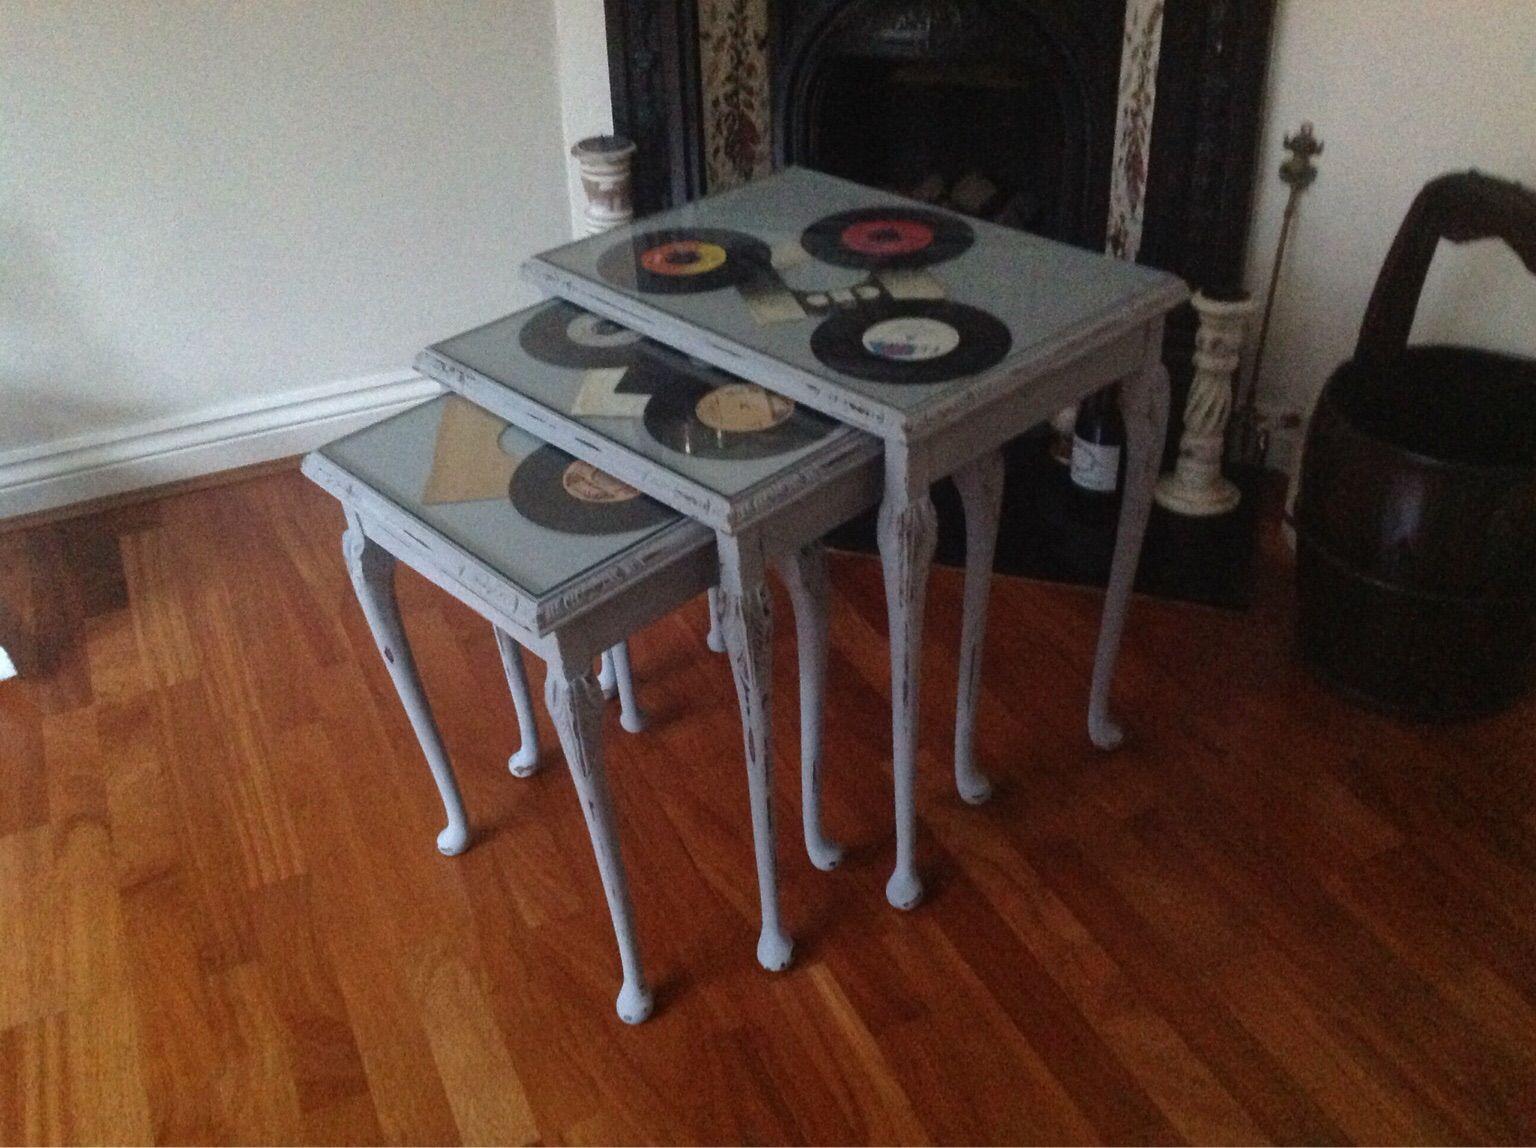 bona hardwood floor mop kit multi purple kits of https en shpock com i vpd ildebqx0i0wk 2018 02 08t023554 with regard to assorted furniture